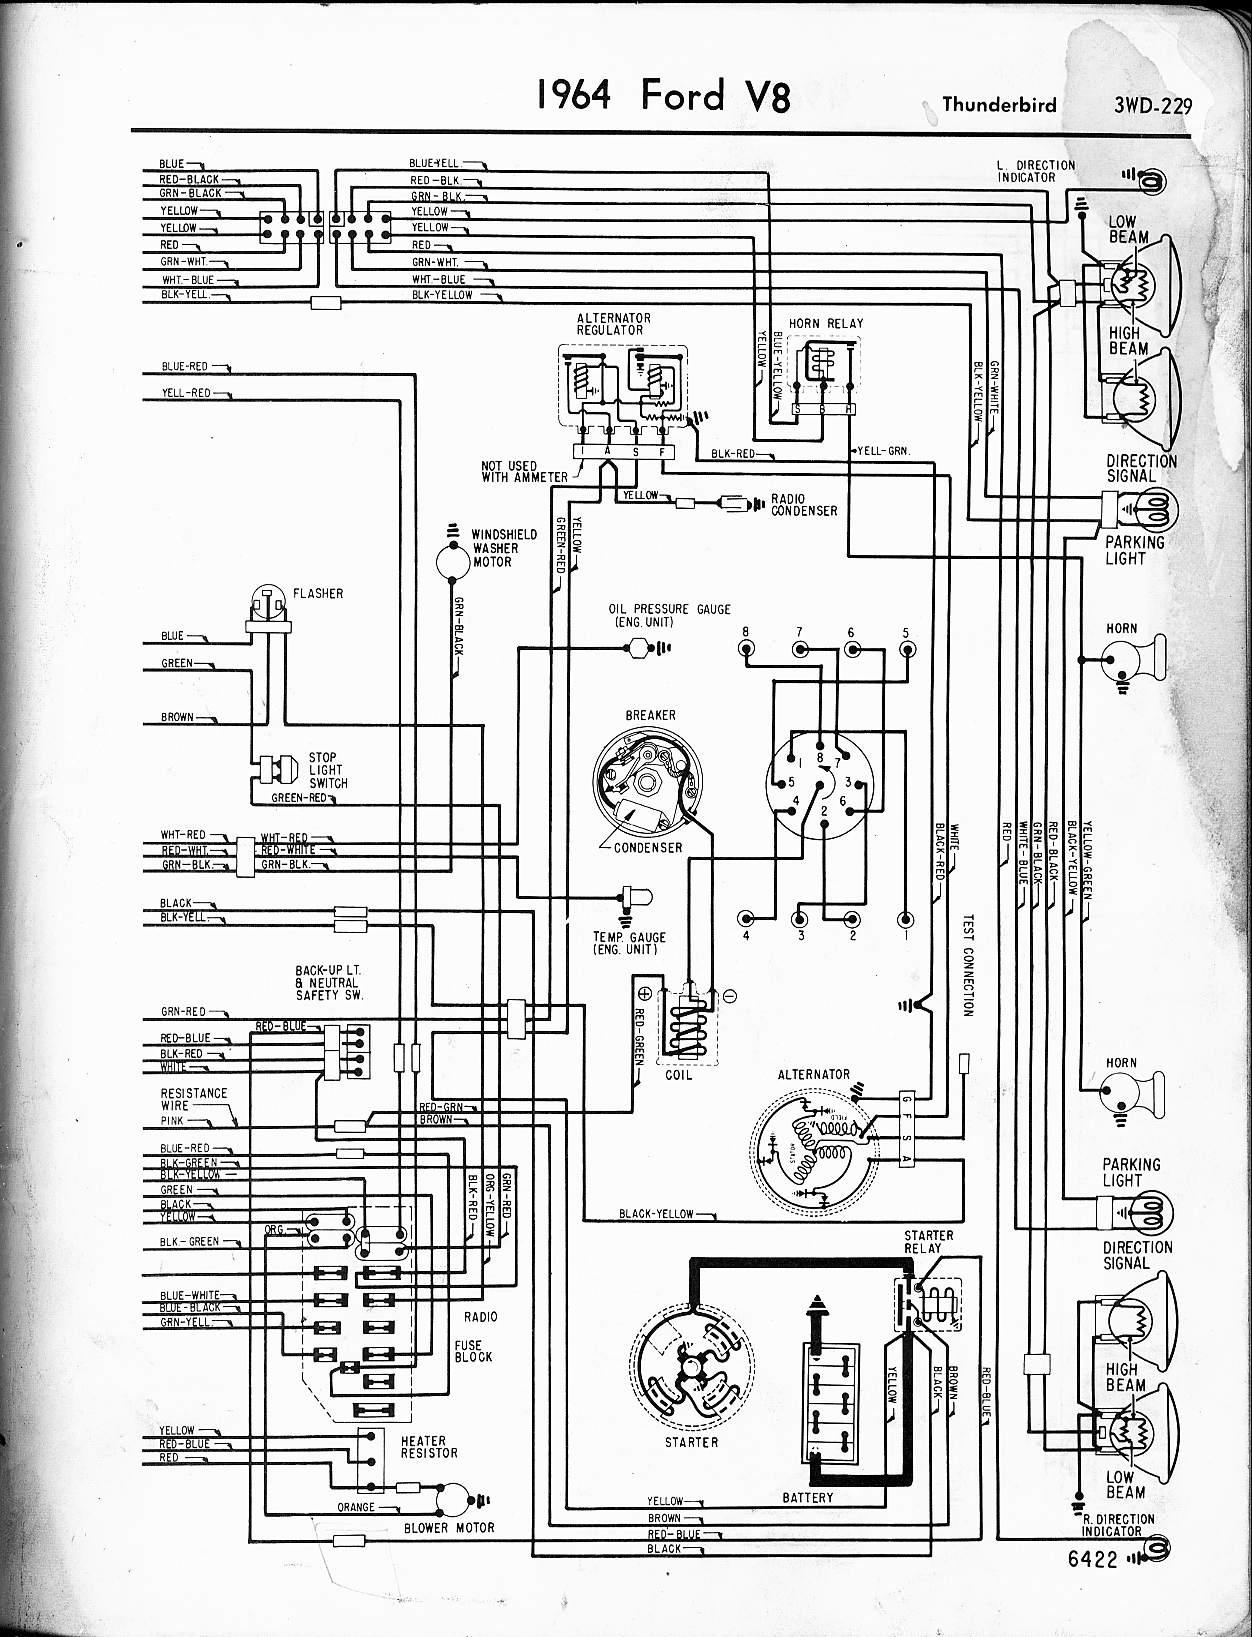 Super 1964 Ford Thunderbird Wiring Wiring Diagram Wiring Cloud Uslyletkolfr09Org